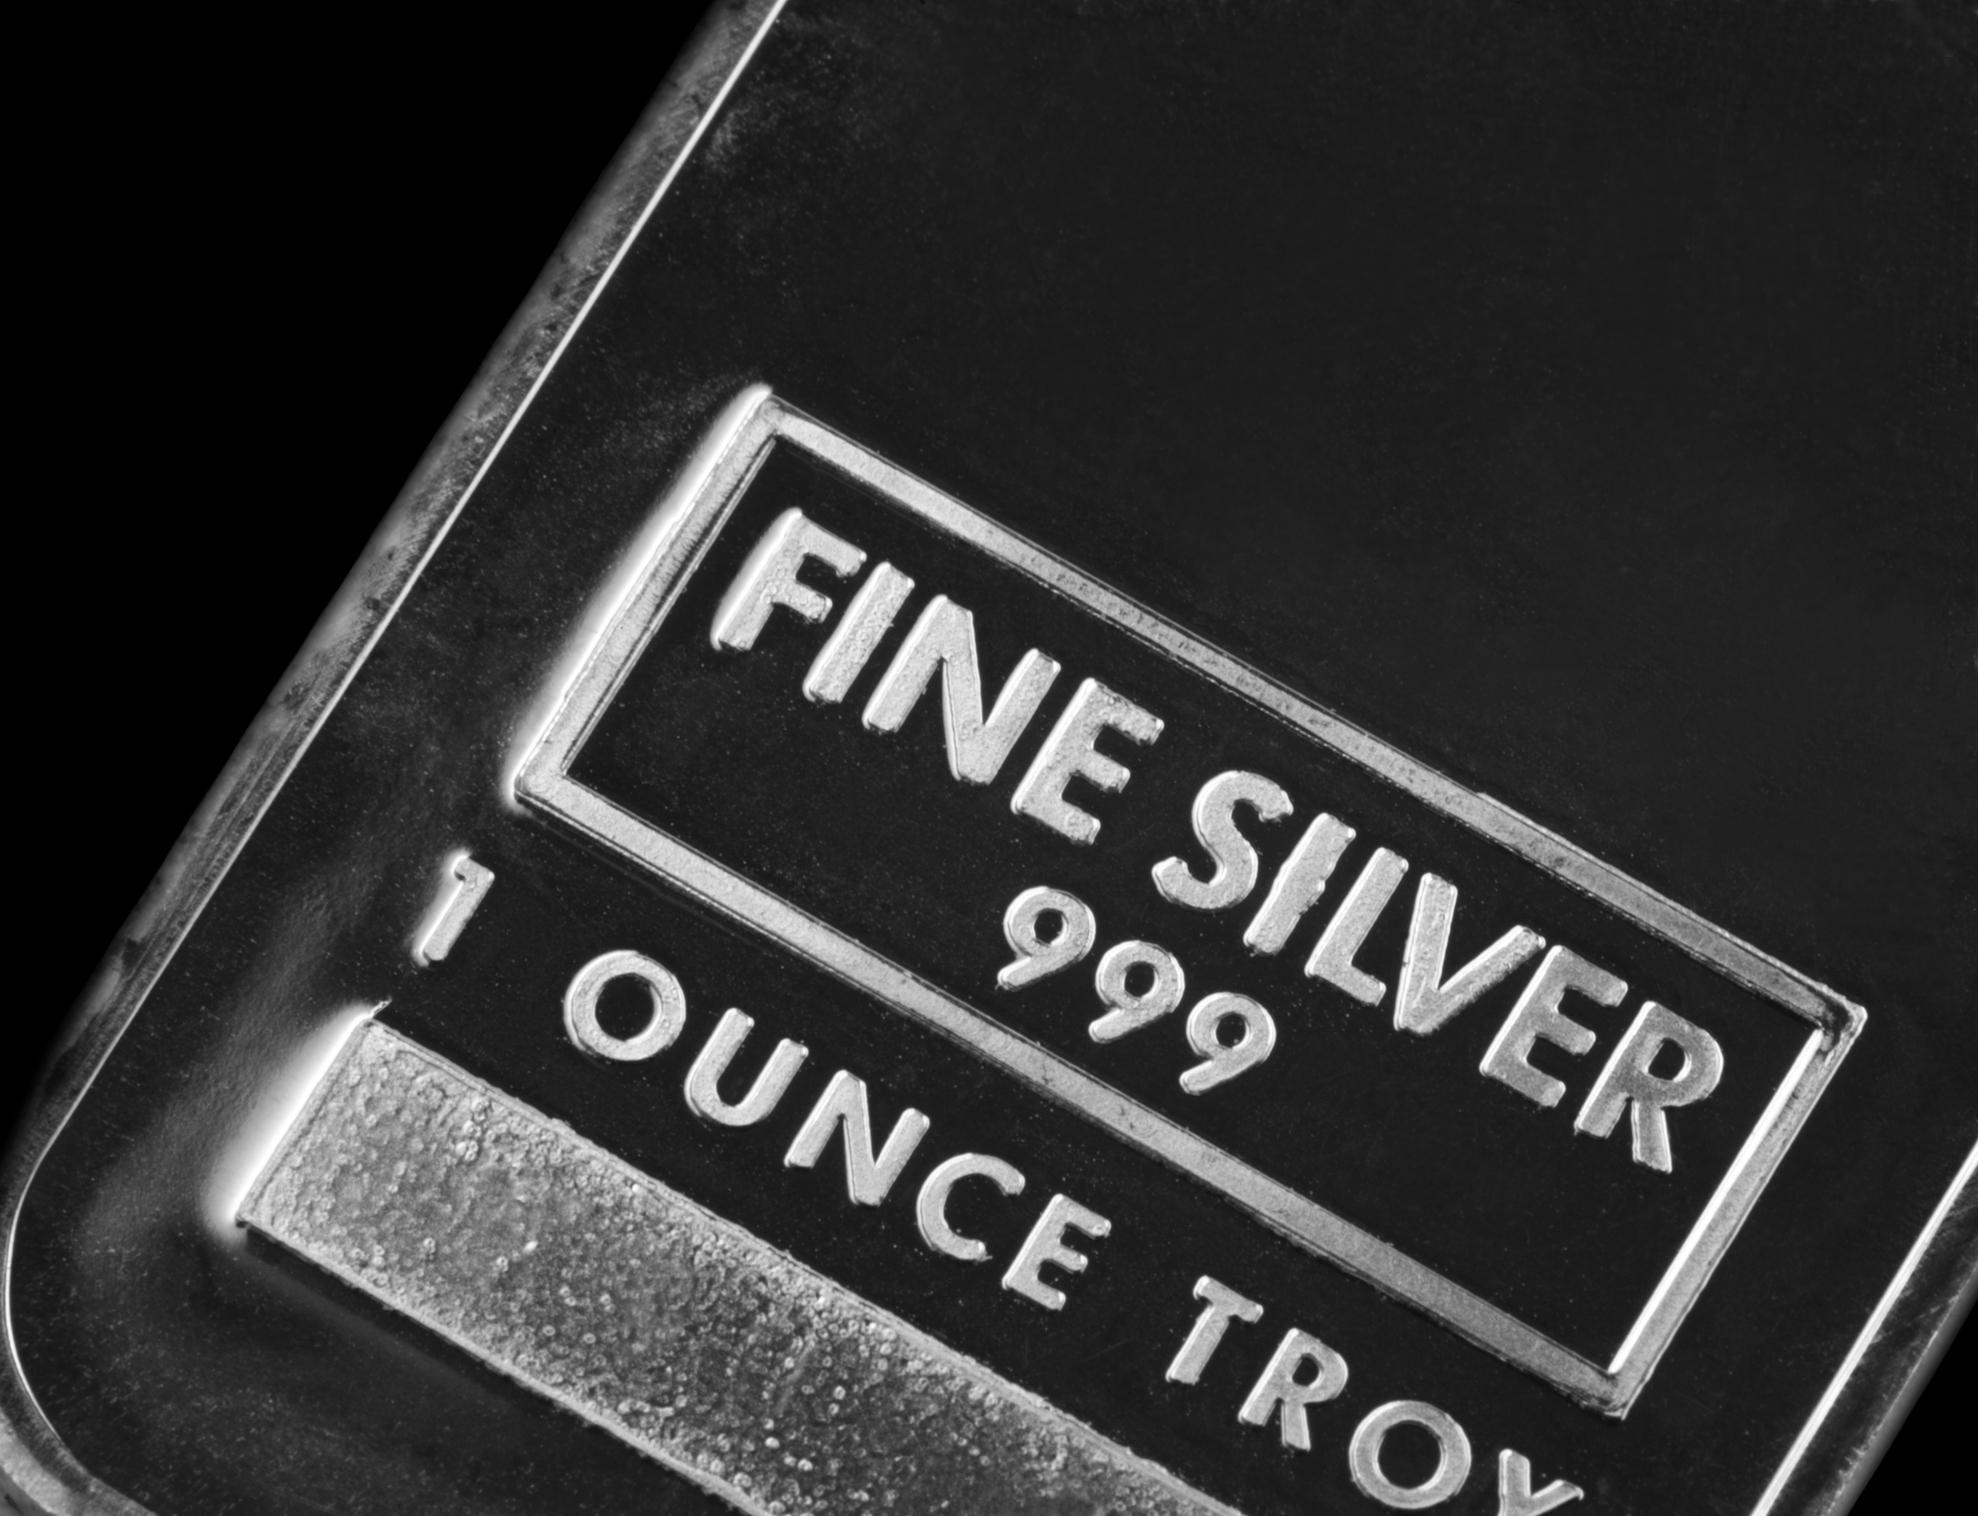 A one-ounce silver bar on a dark background.